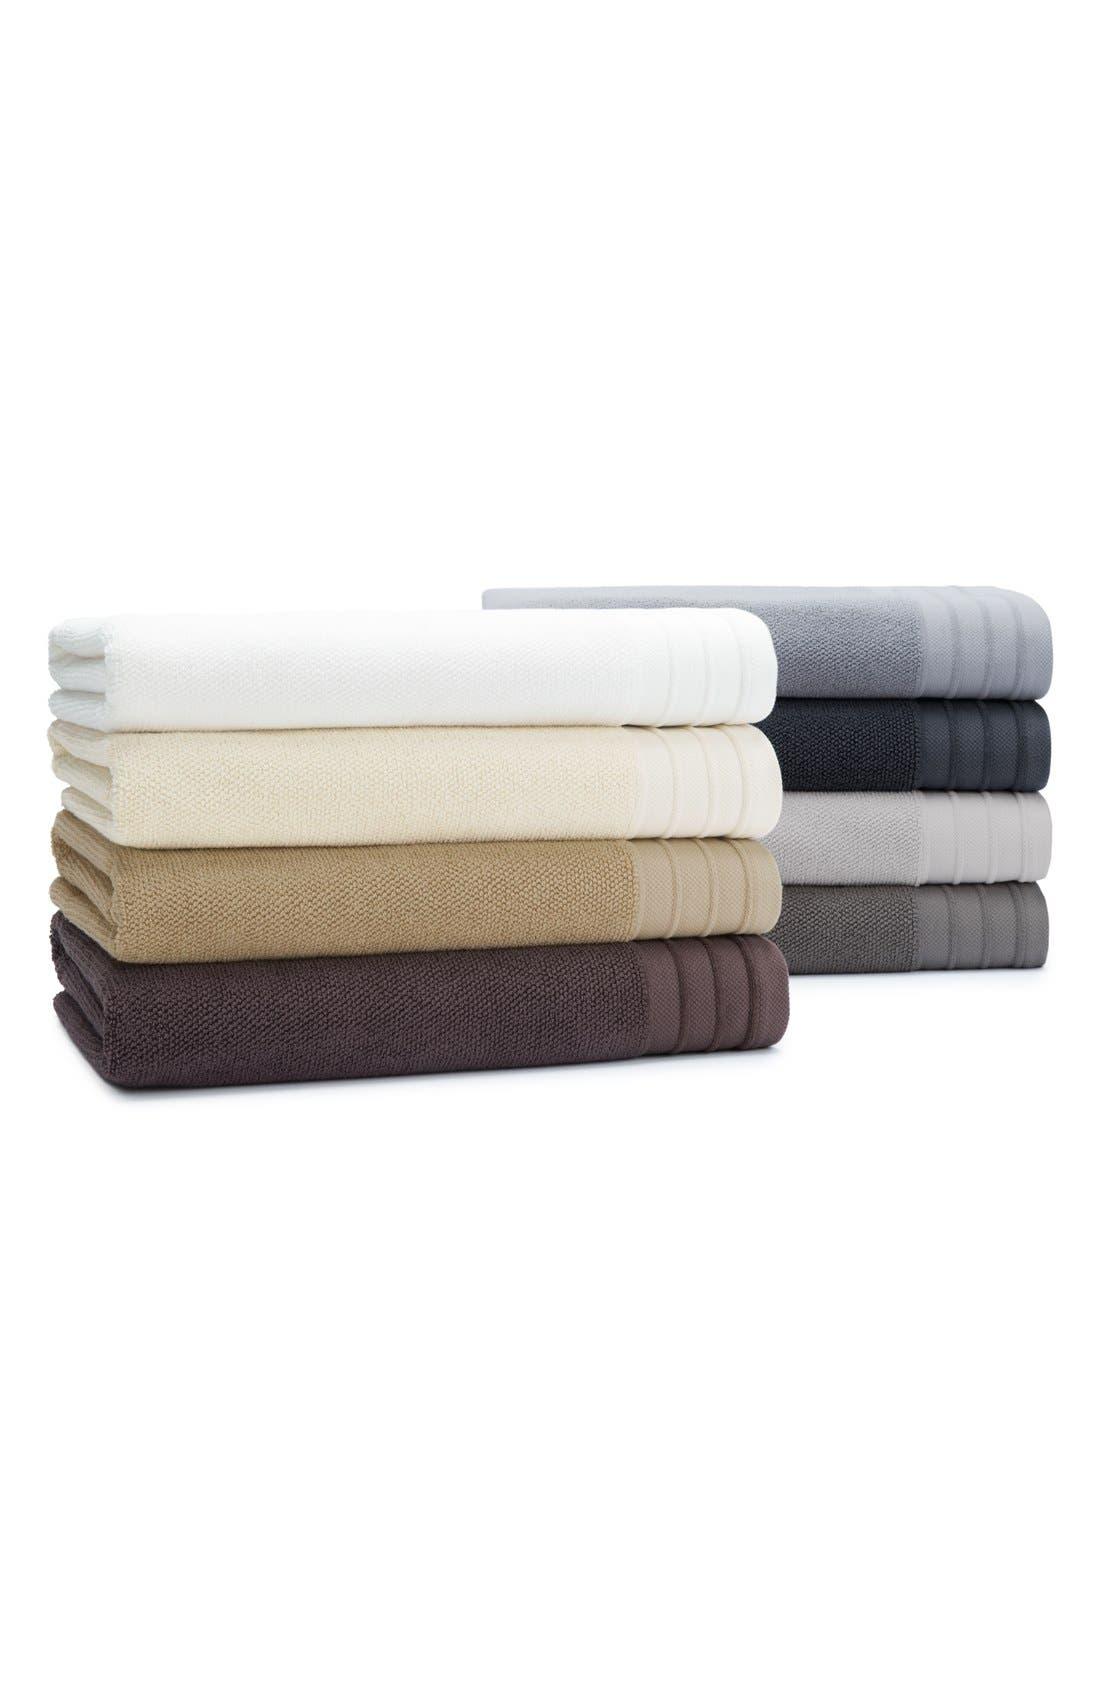 Classic Luxe Bath Towel,                             Alternate thumbnail 4, color,                             GRANITE